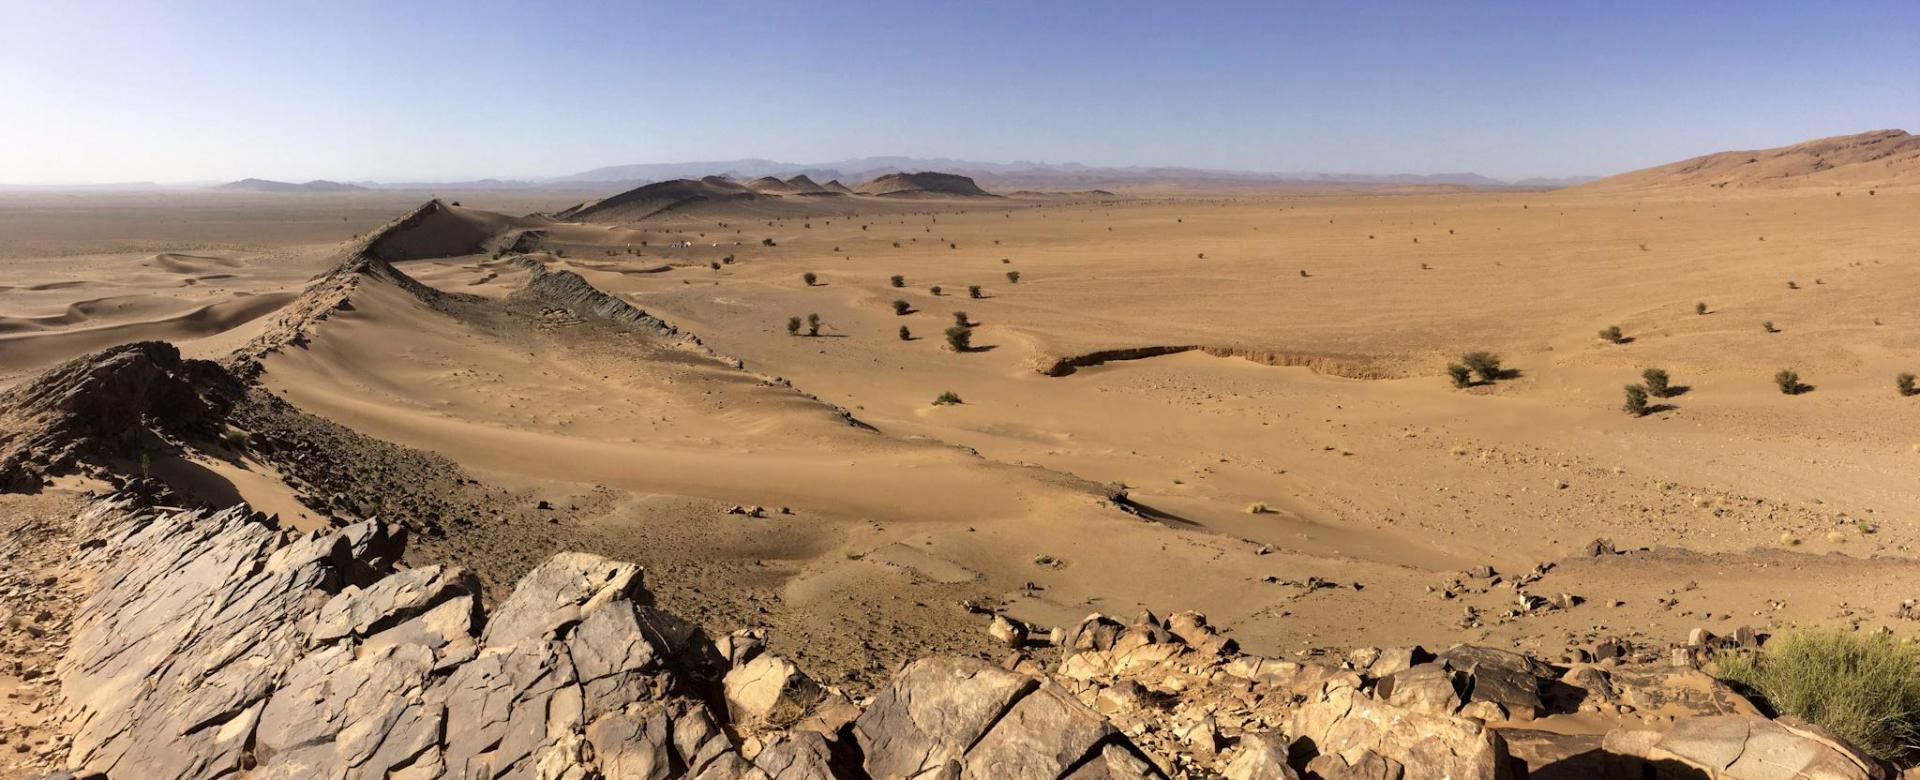 rando desert maroc - les grands espaces du sud - d u00e9couverte - maroc